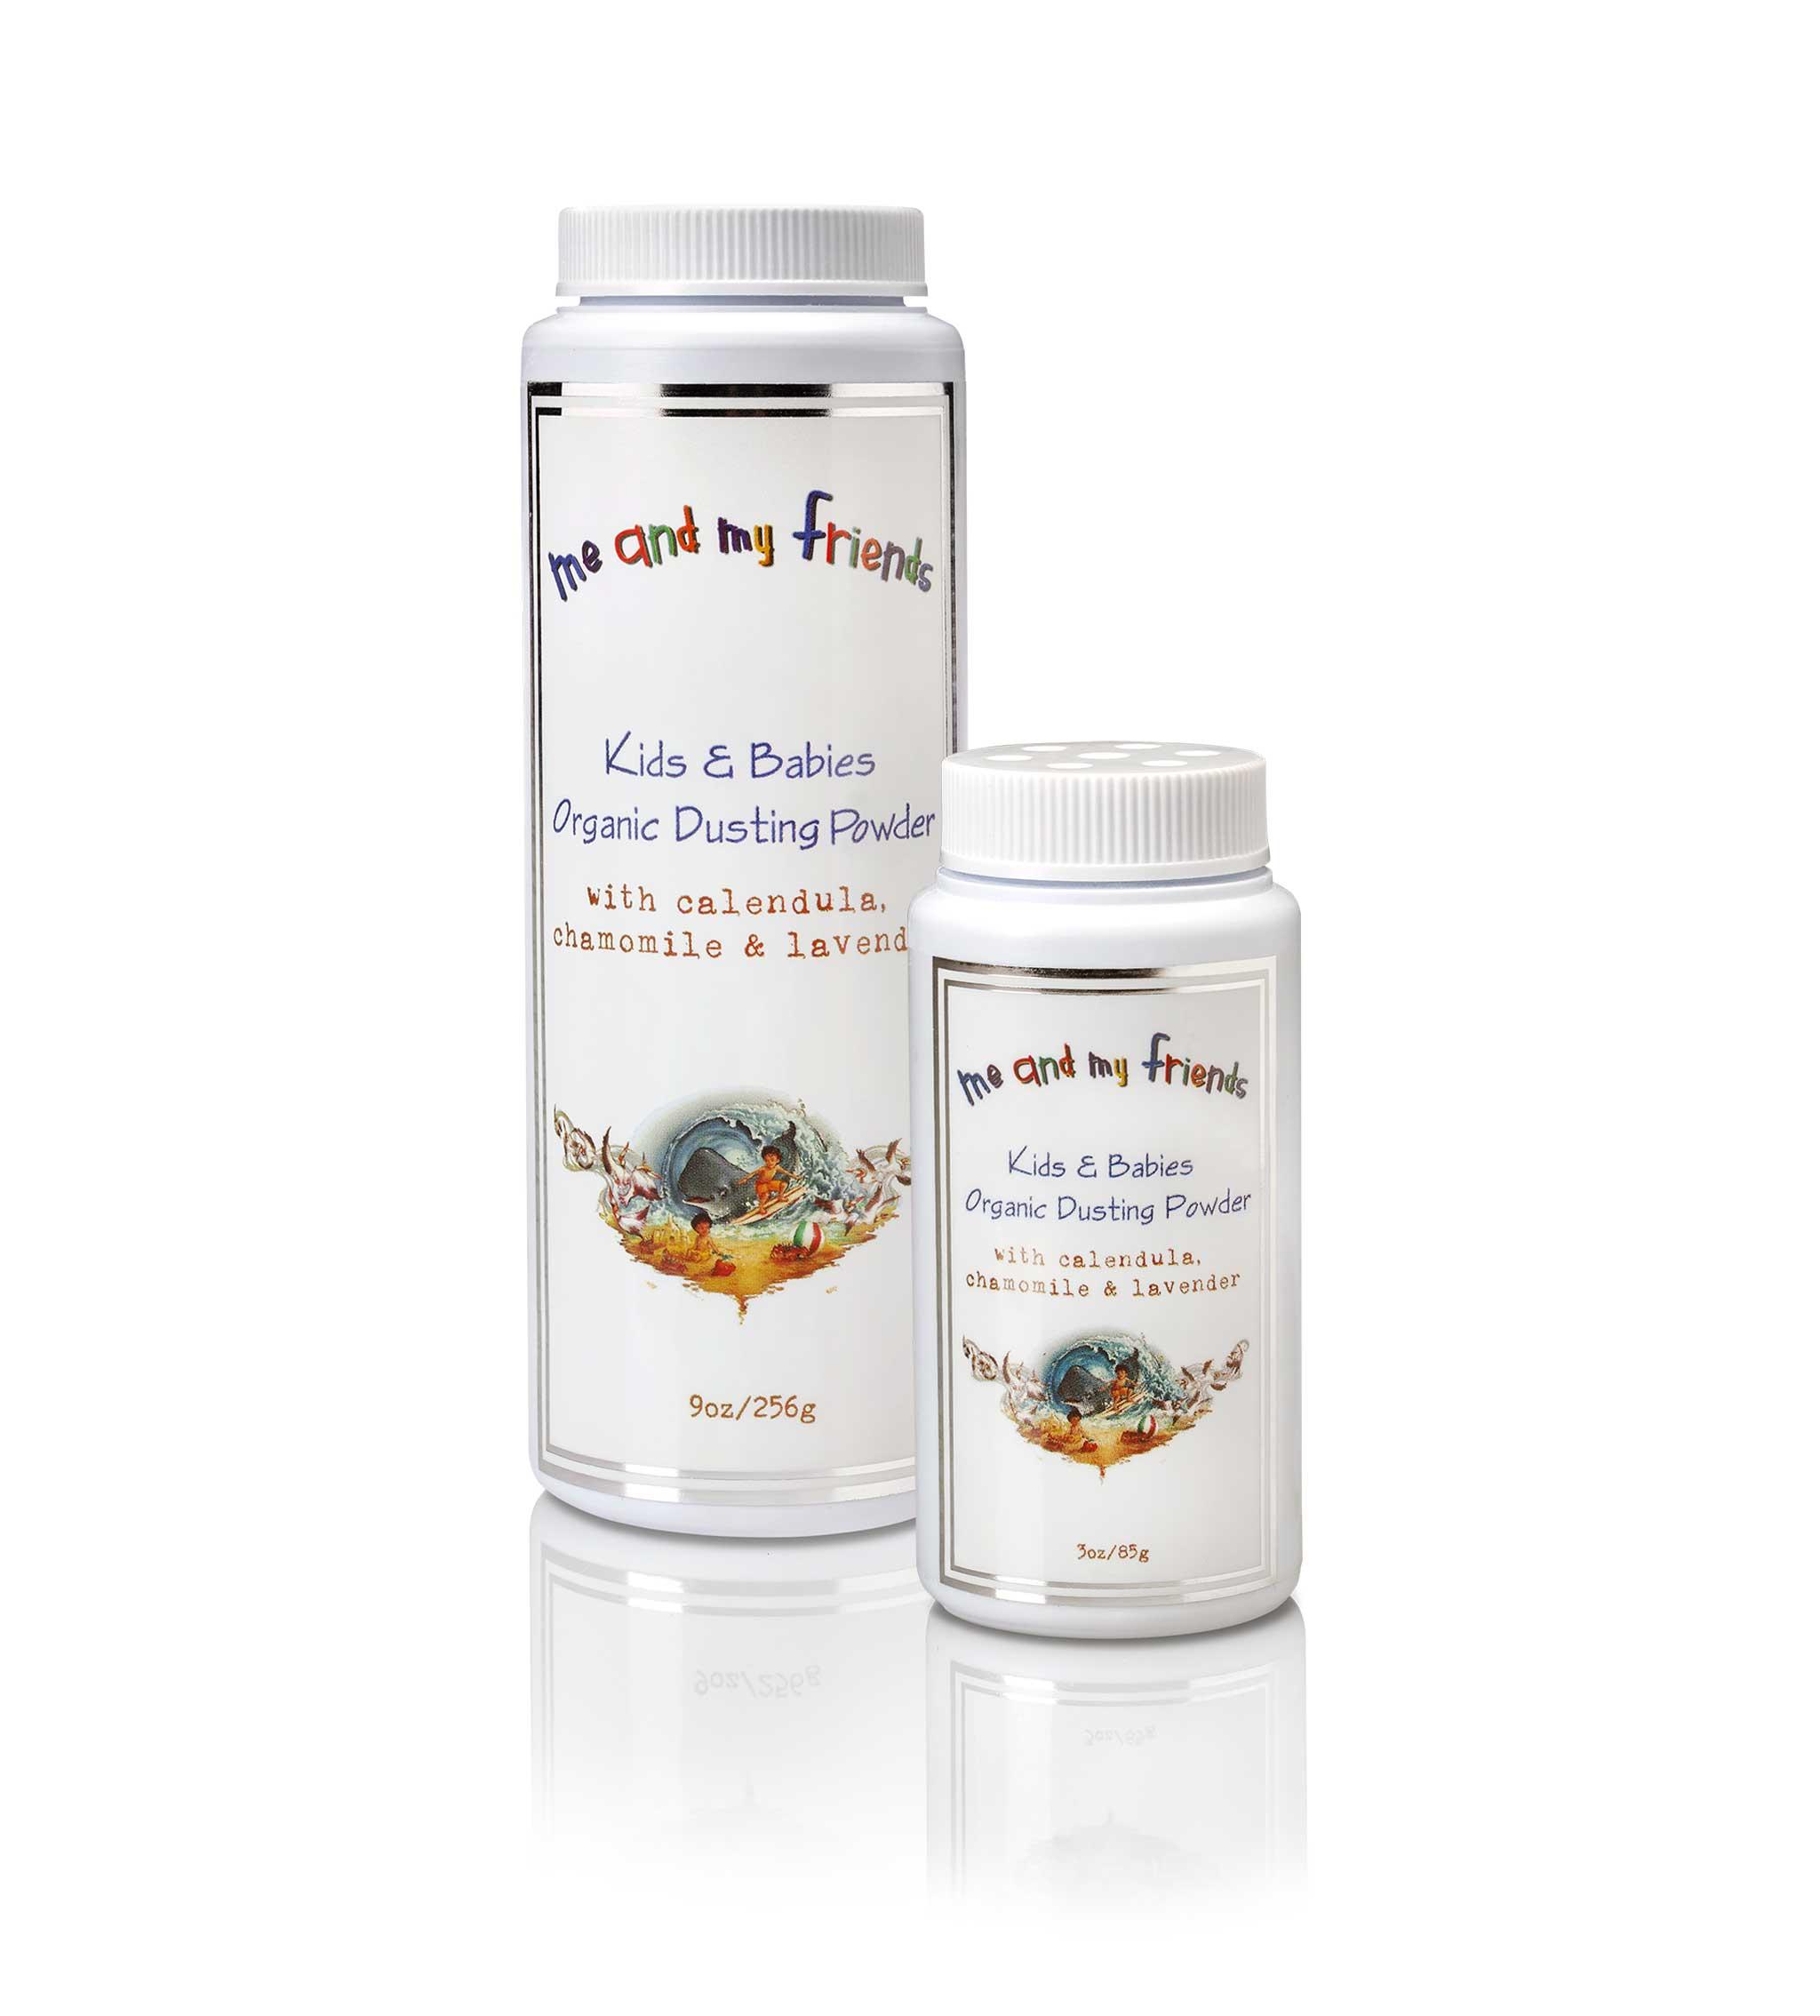 100% all natural organic dusting powder